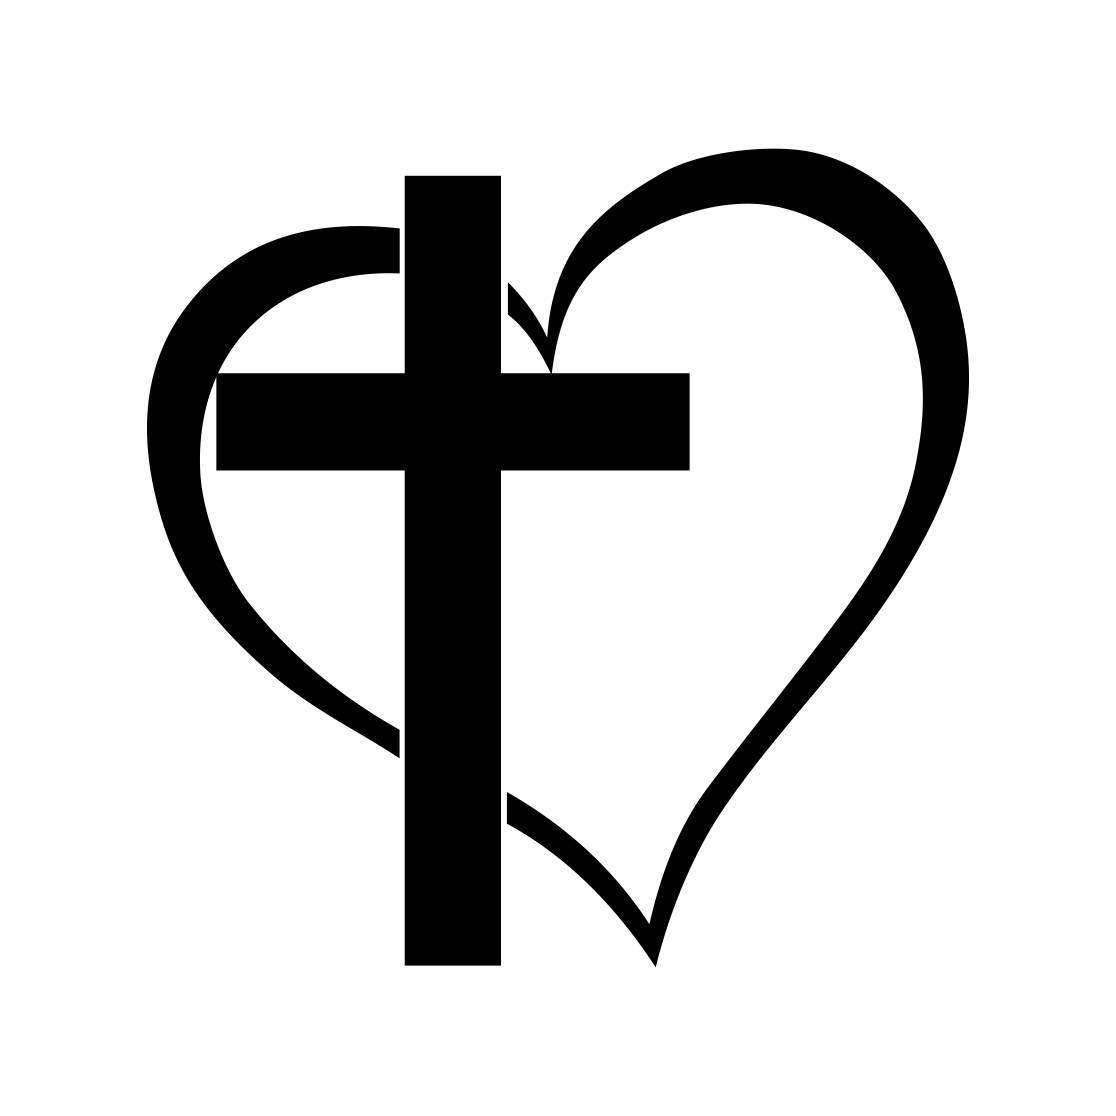 1116x1116 Cross Heart Jesus God Heart Love Graphics Svg Dxf Eps Png Cdr Etsy